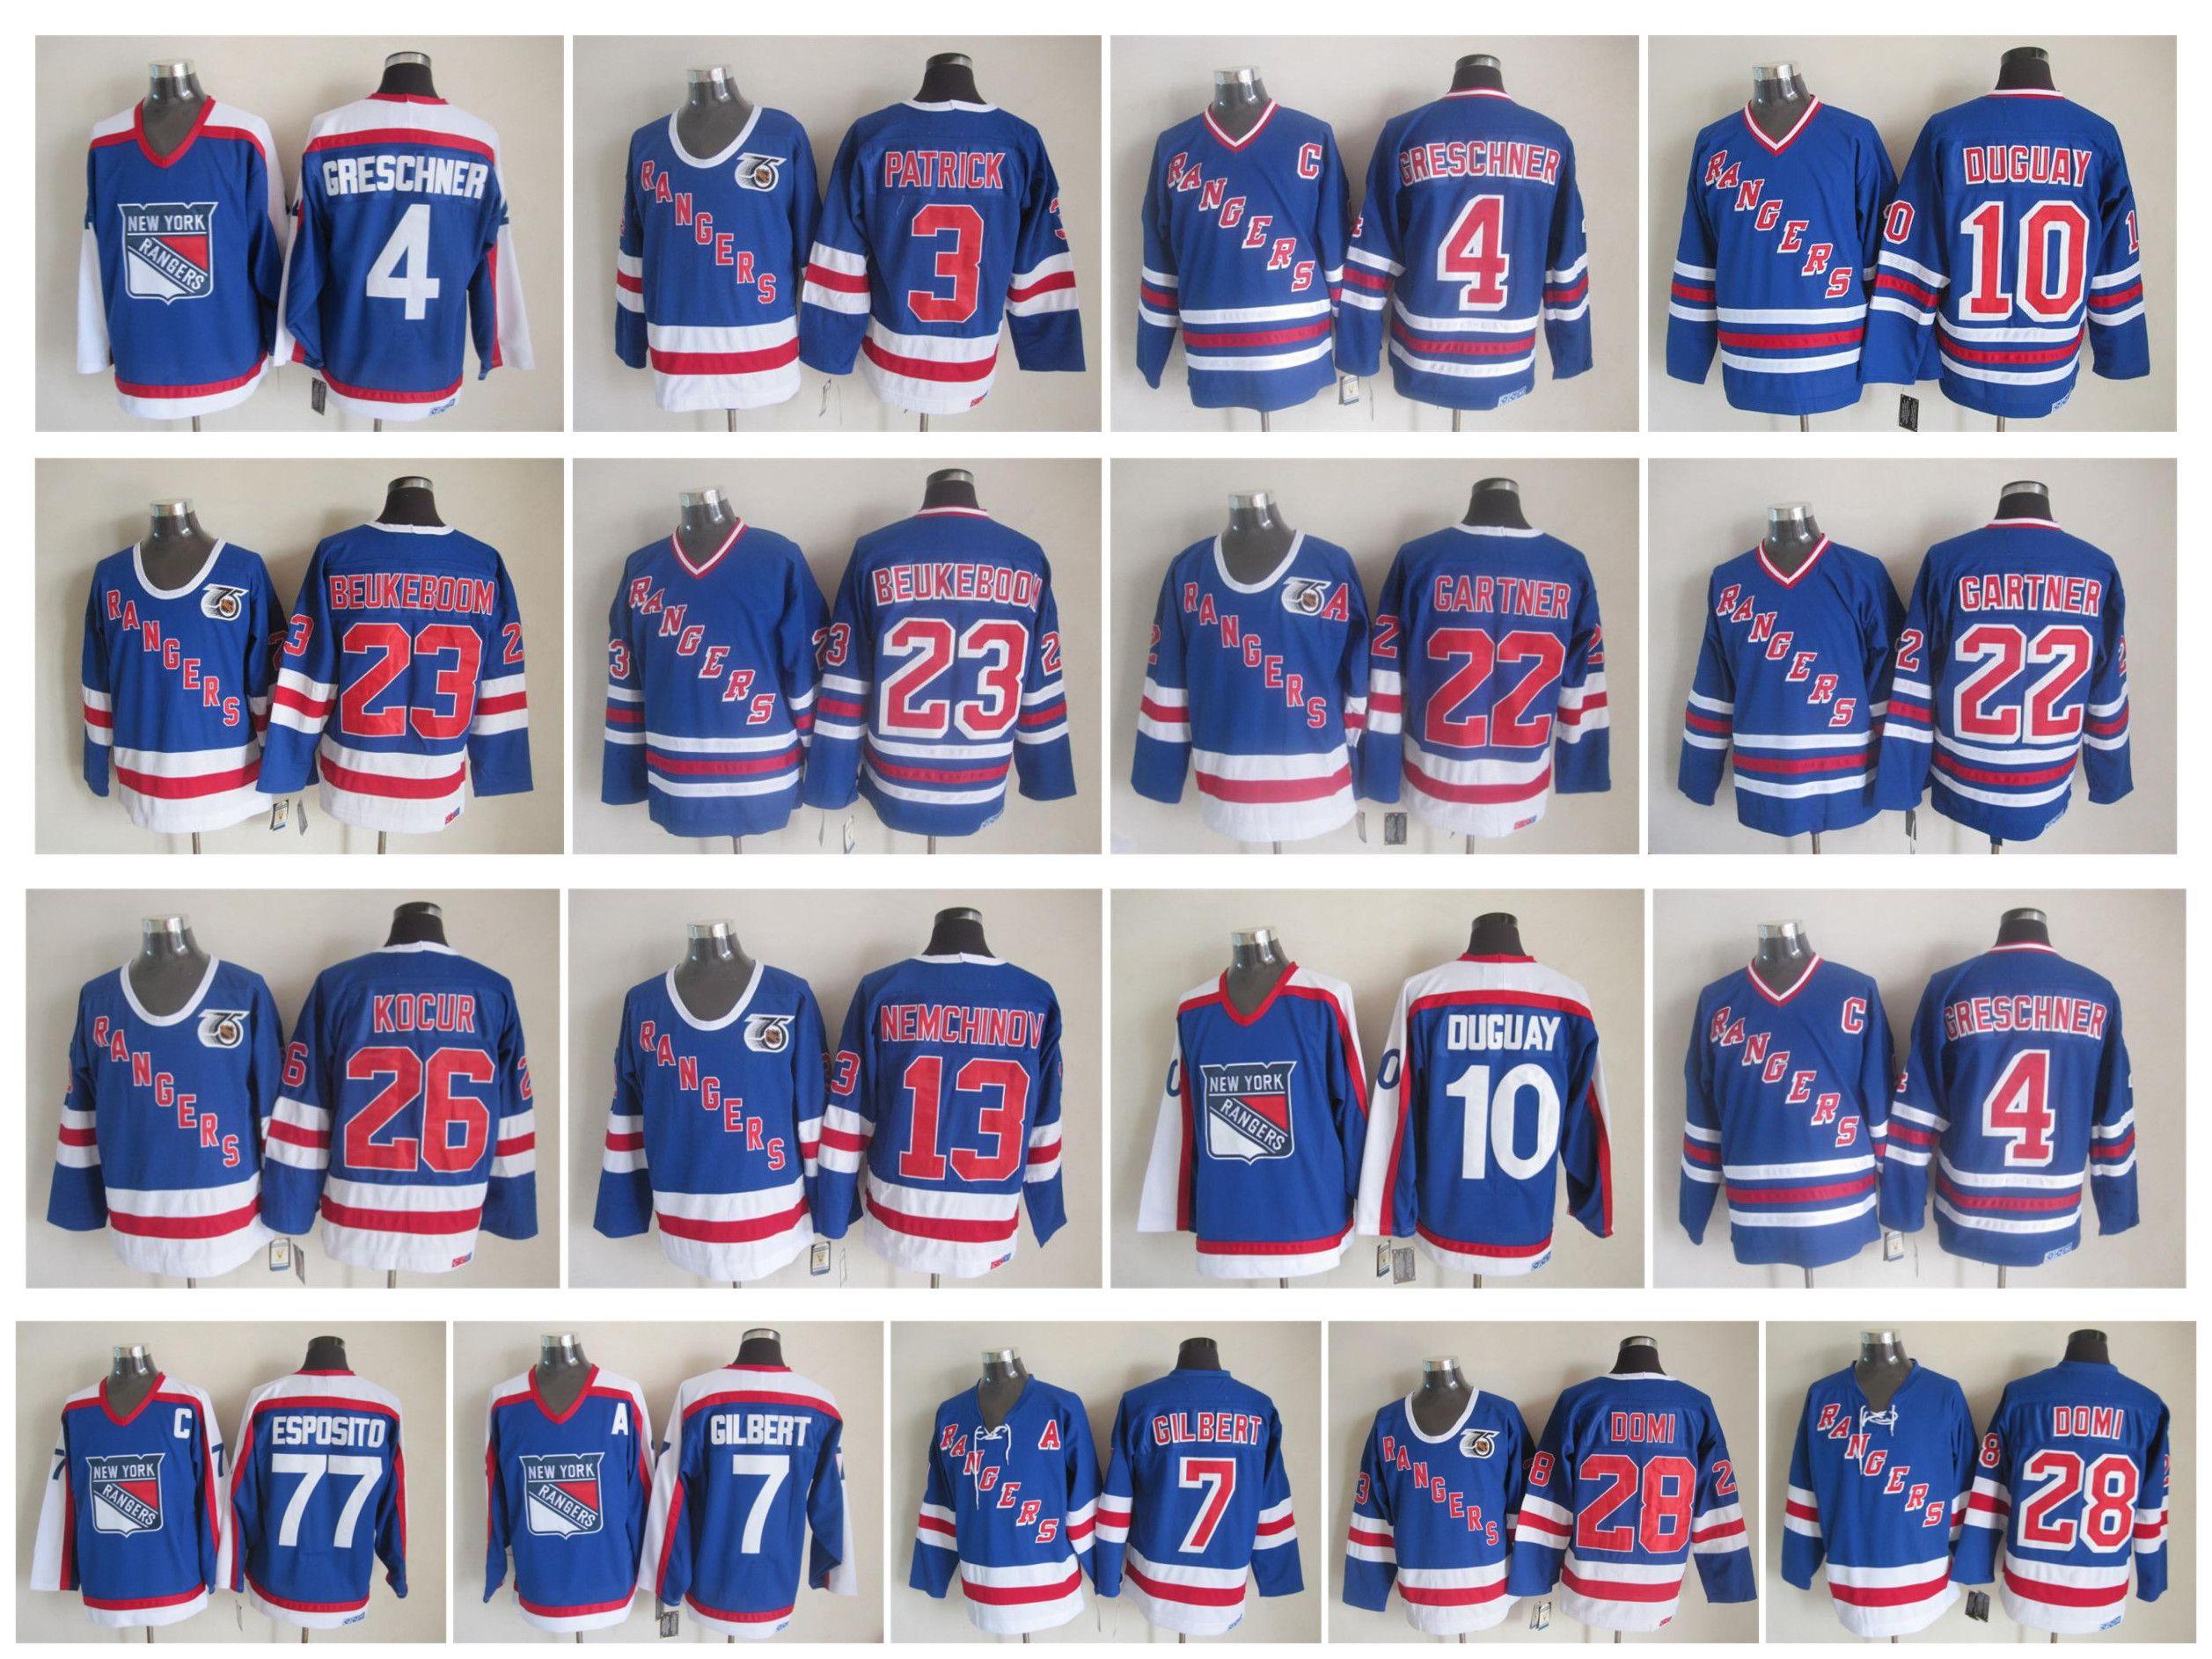 Vintage New York Rangers Jersey 3 James Patrick 4 Ron Greschner 7 Rod  Gilbert 10 Ron Duguay 28 Tie Dom 77 Phil Esposito Gartner CCM Hockey  Edmonton Jerseys ... 55b64f188